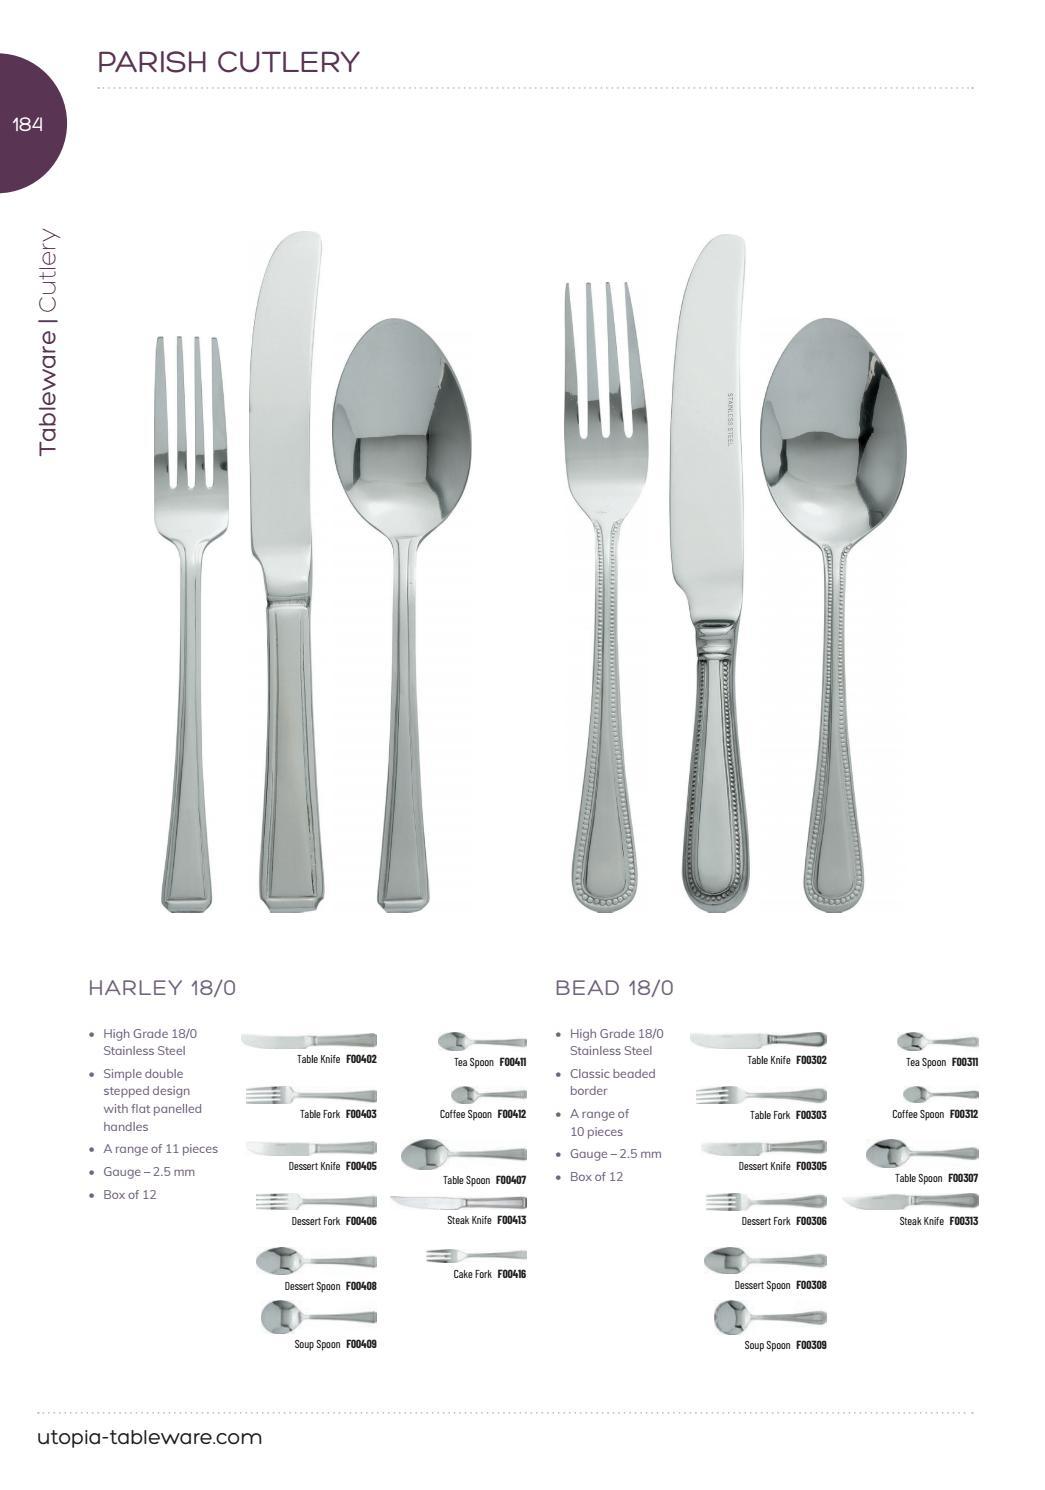 Pack of 12 Parish Cutlery Utopia F00409 Harley Soup Spoon